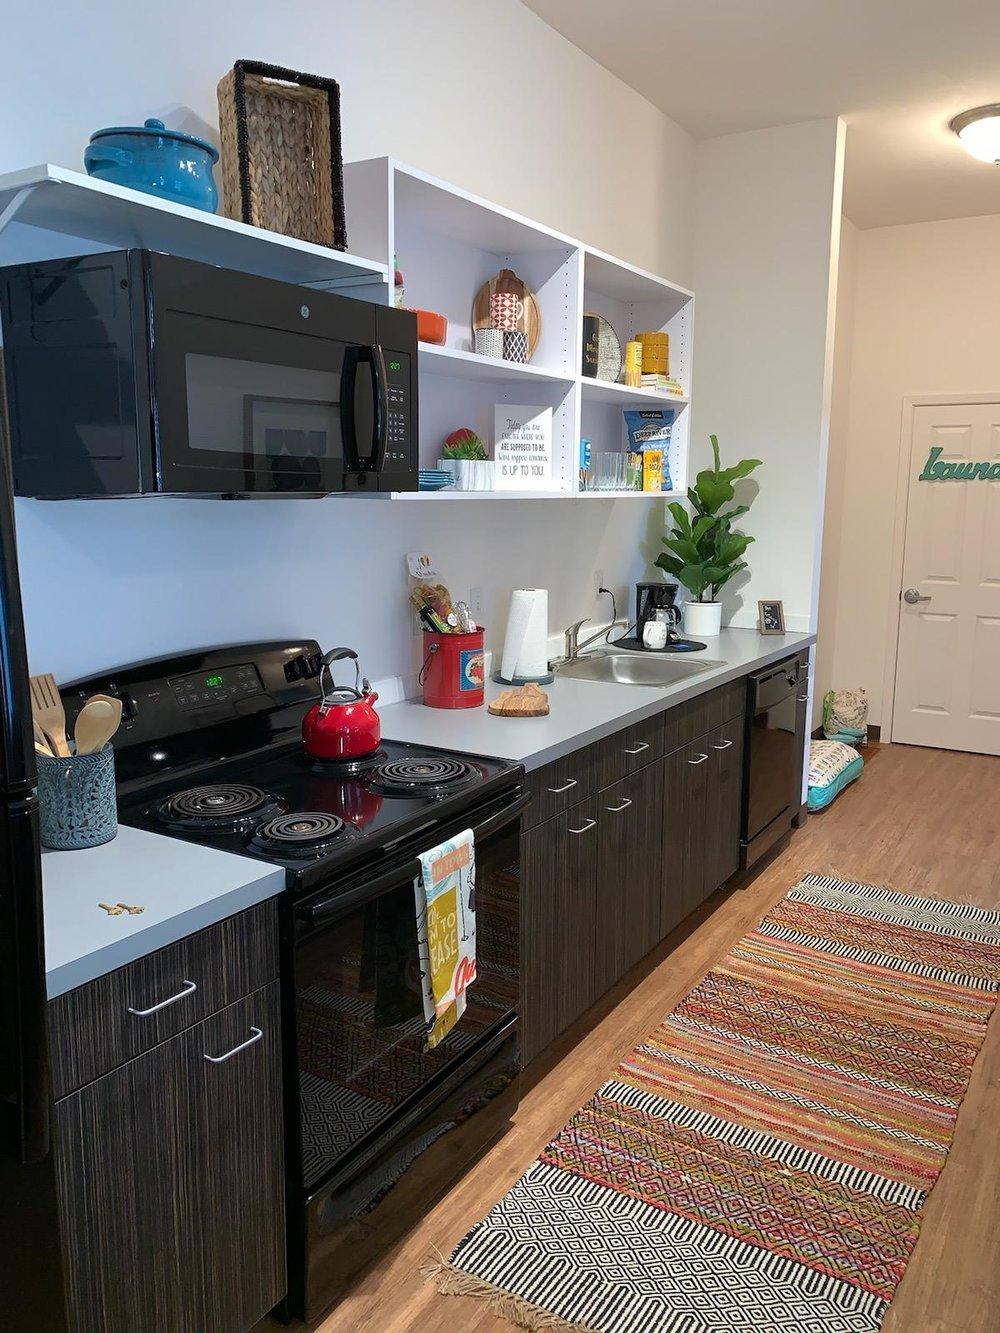 full appliance package student housing